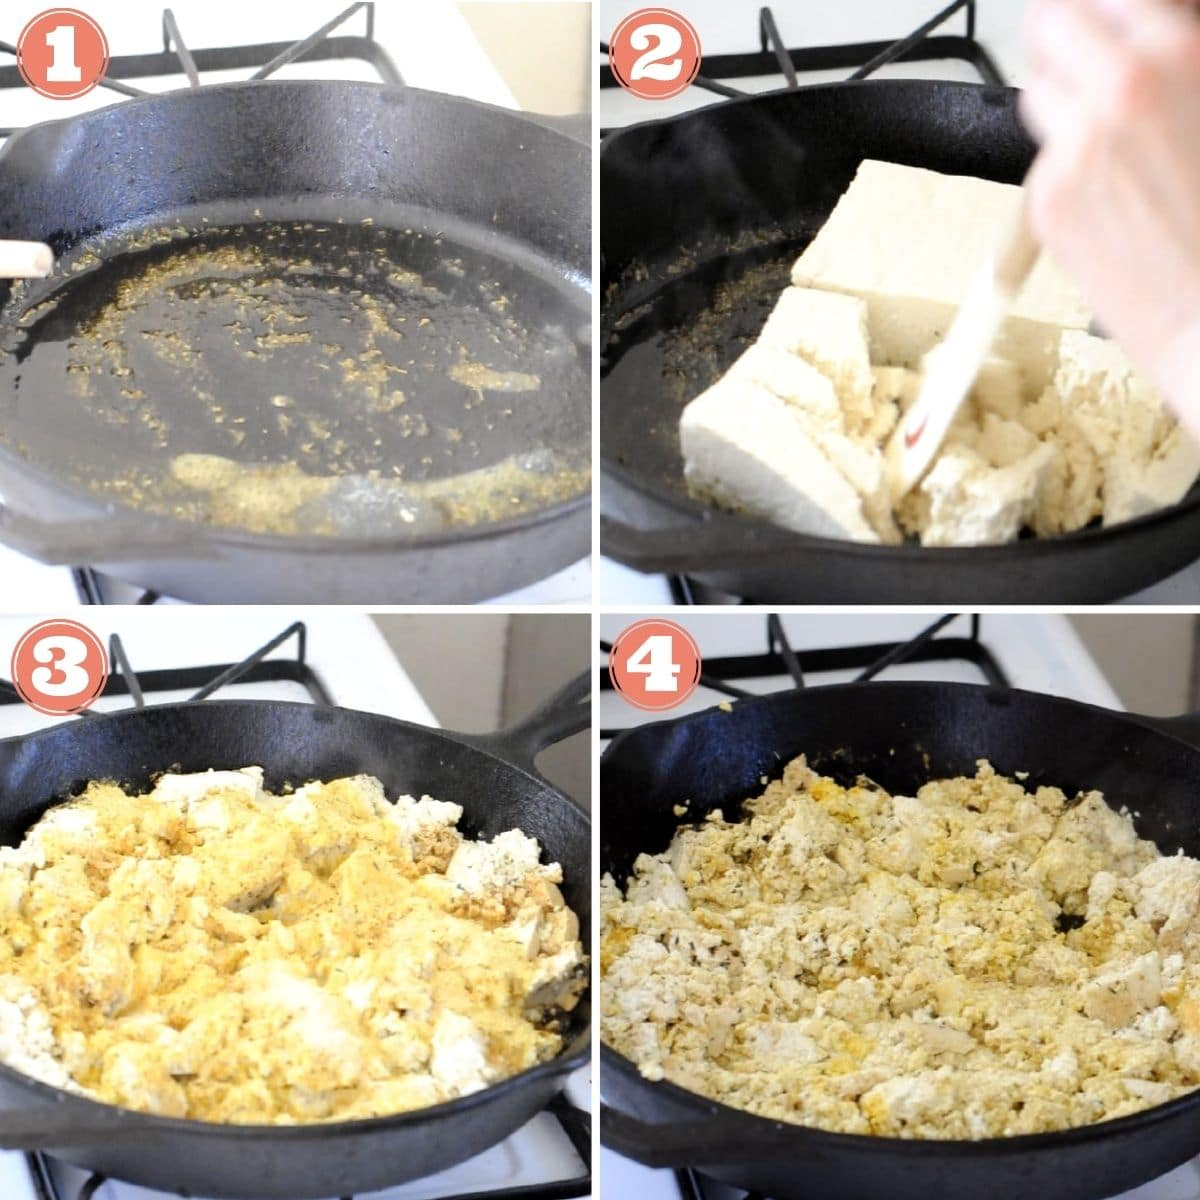 Steps 1 through 4 to make a tofu scramble